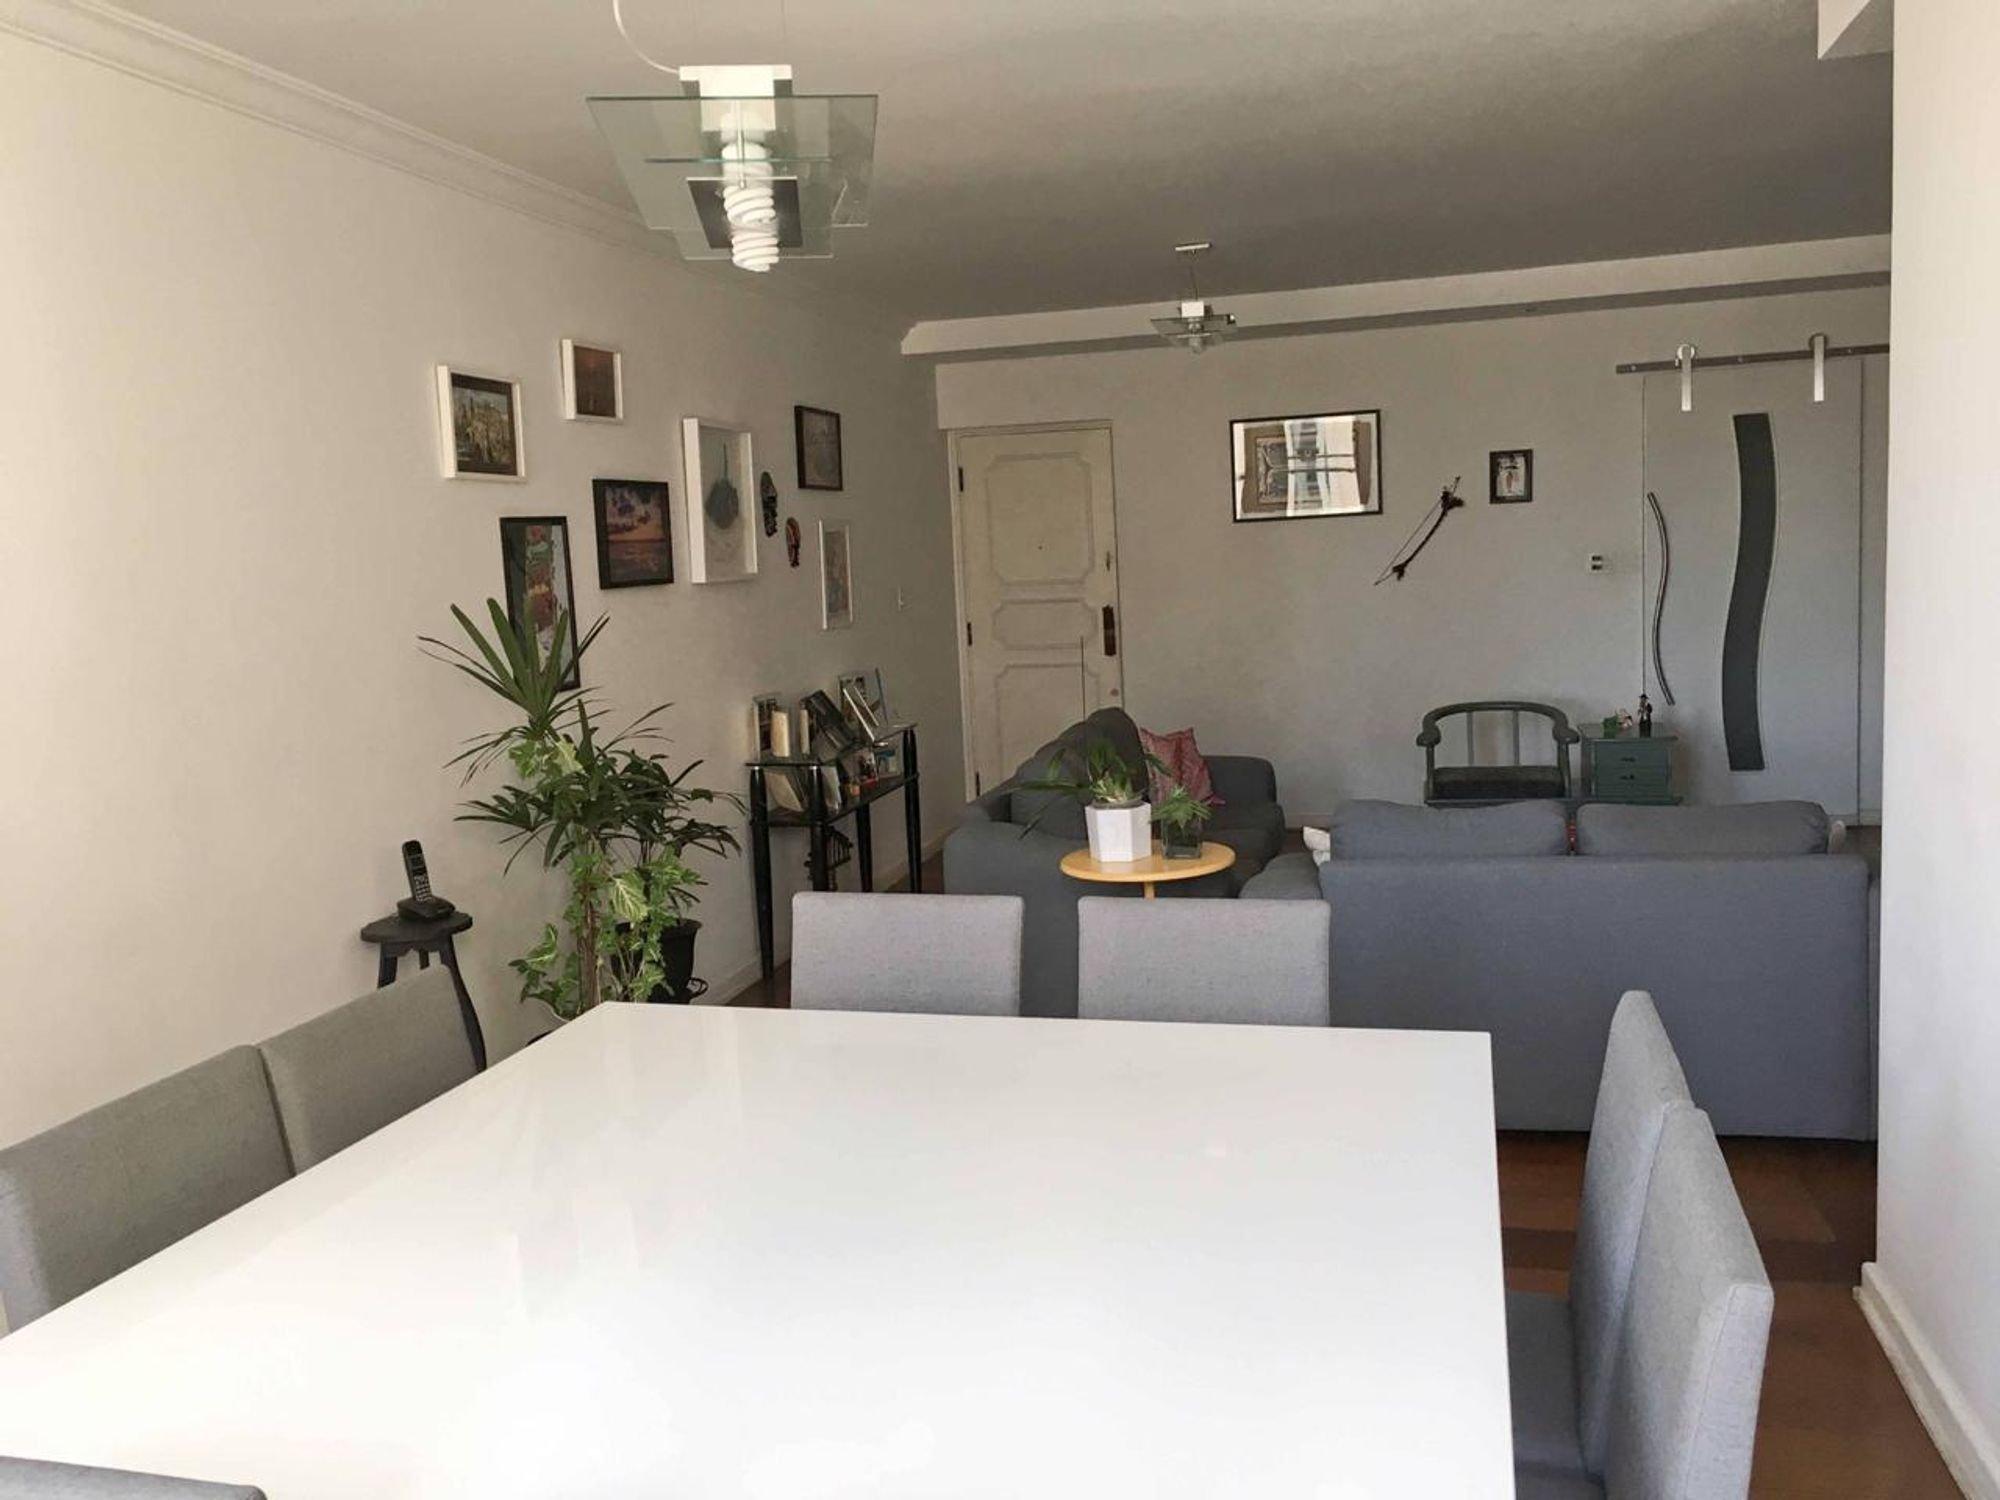 Nesta foto há vaso de planta, sofá, cadeira, mesa de jantar